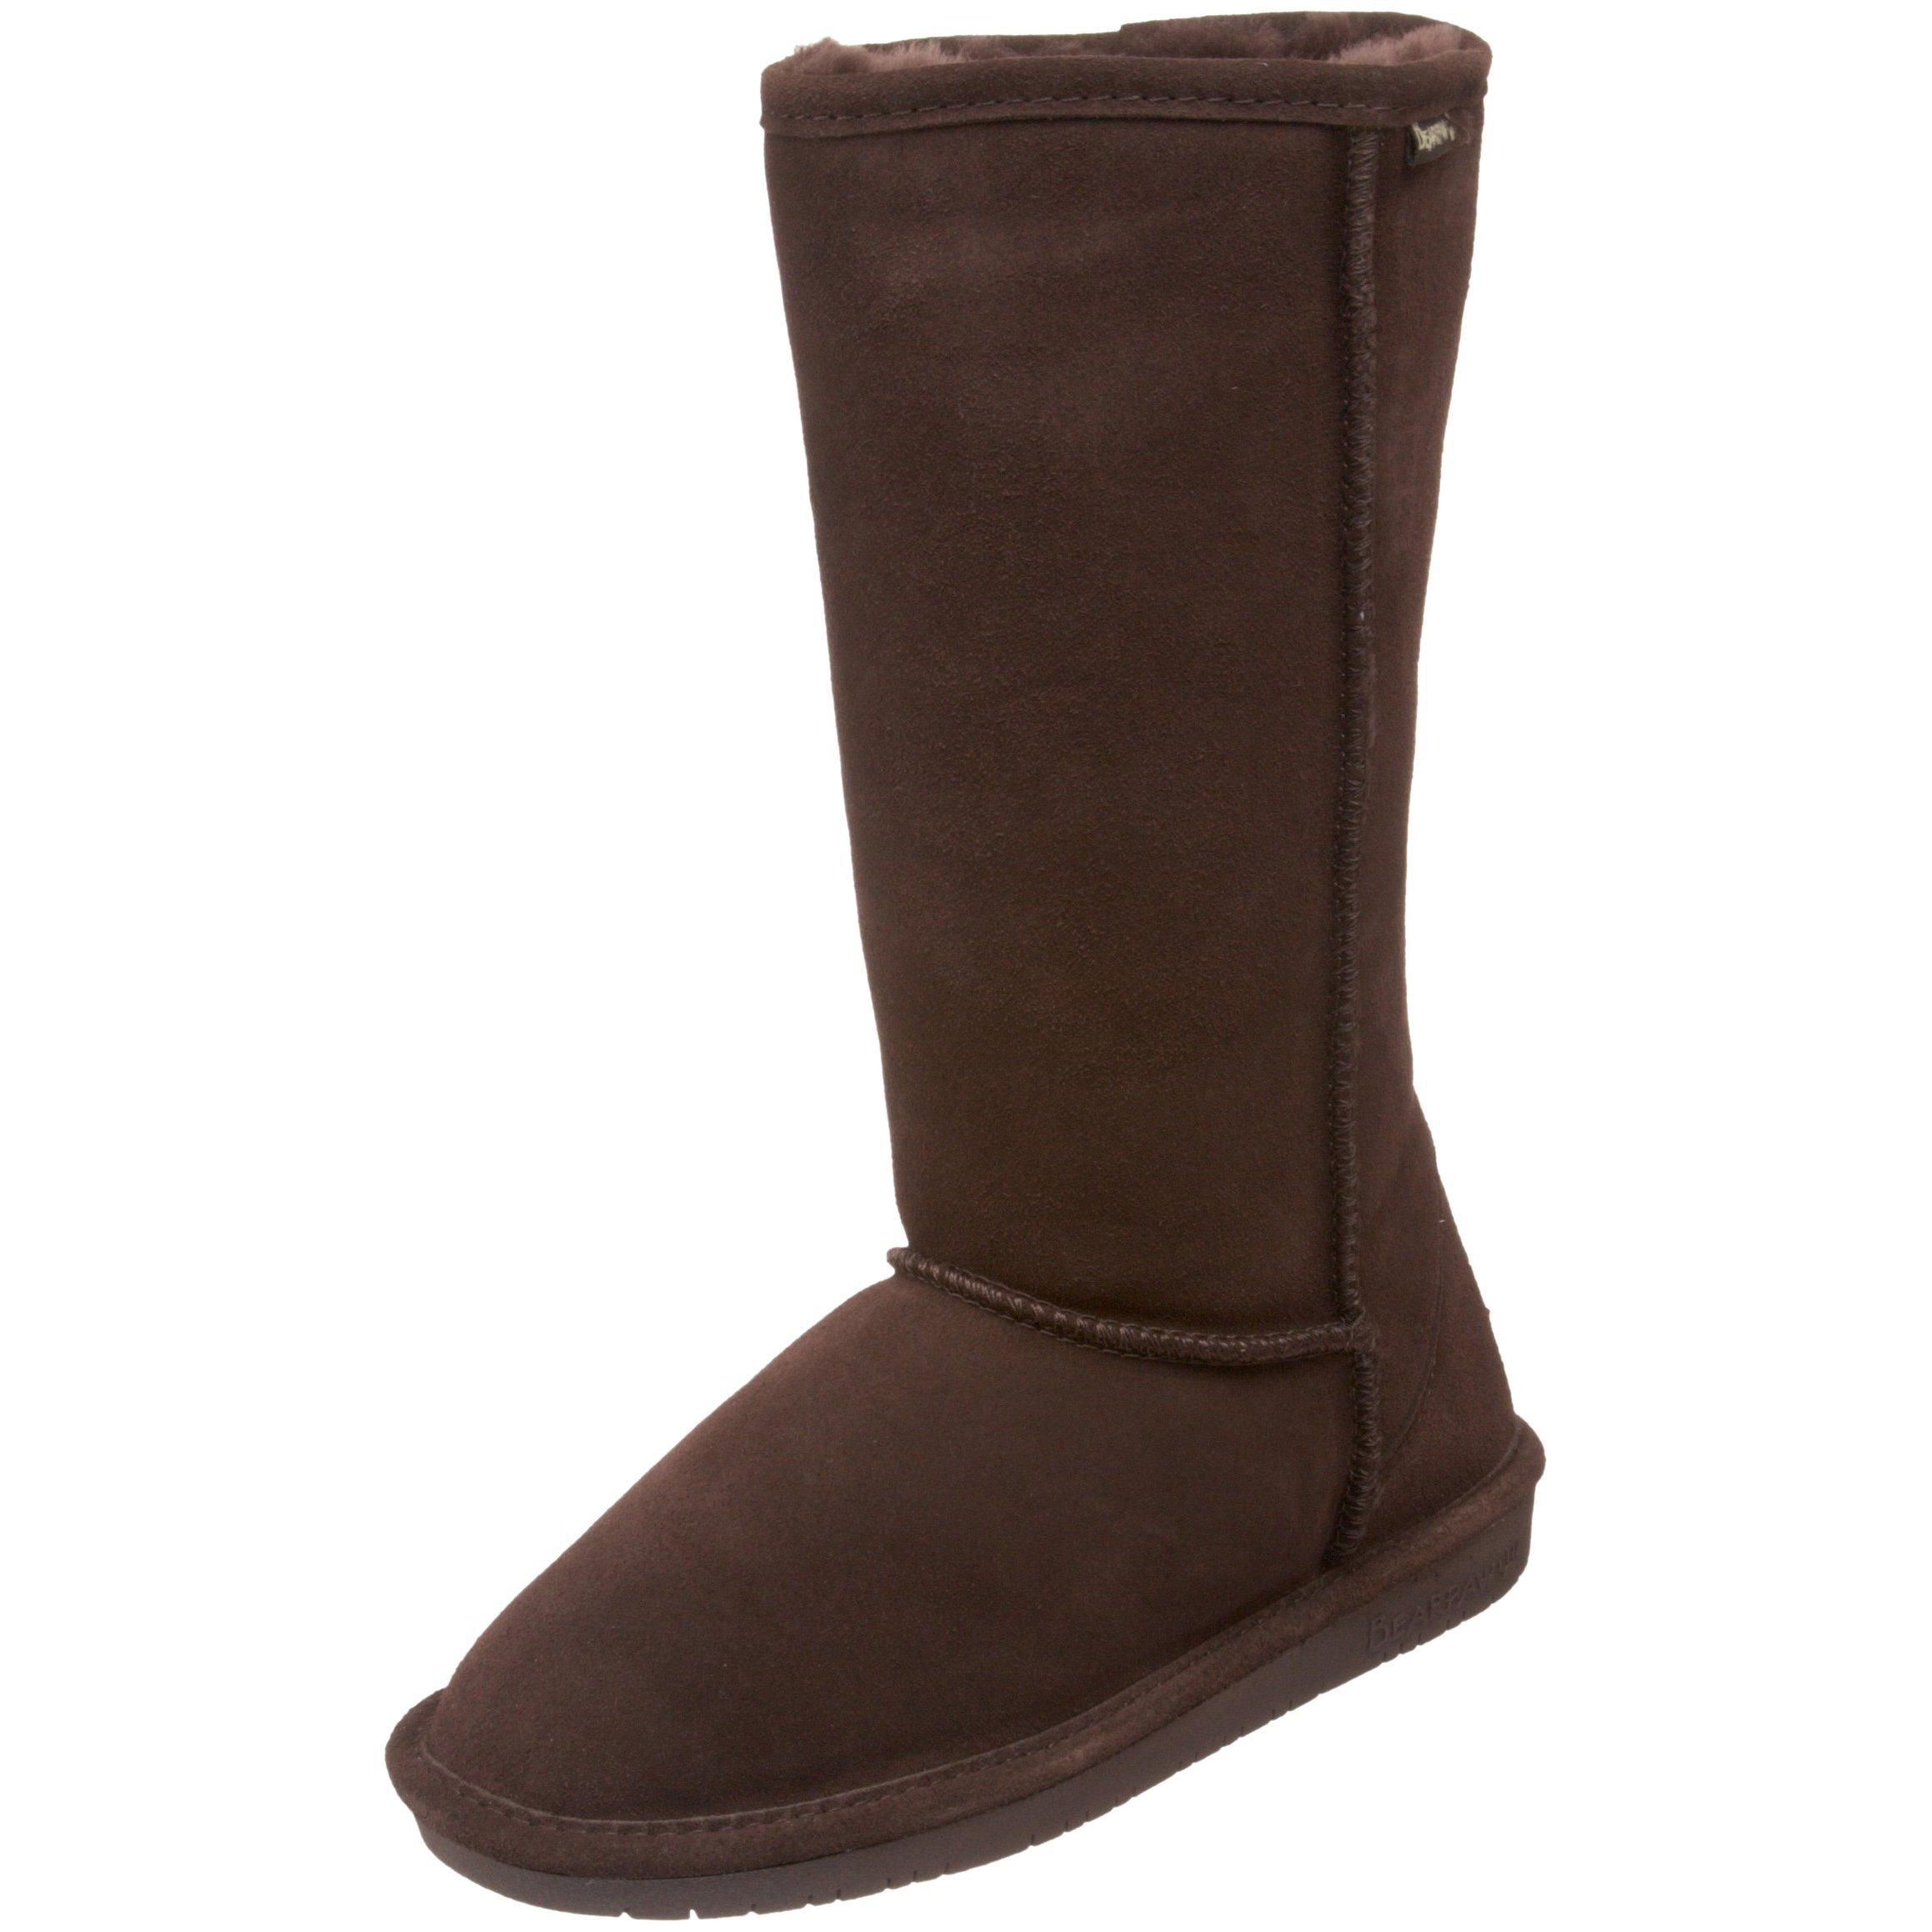 BEARPAW Women's Emma Tall Winter Boot, Chocolate, 10 M US